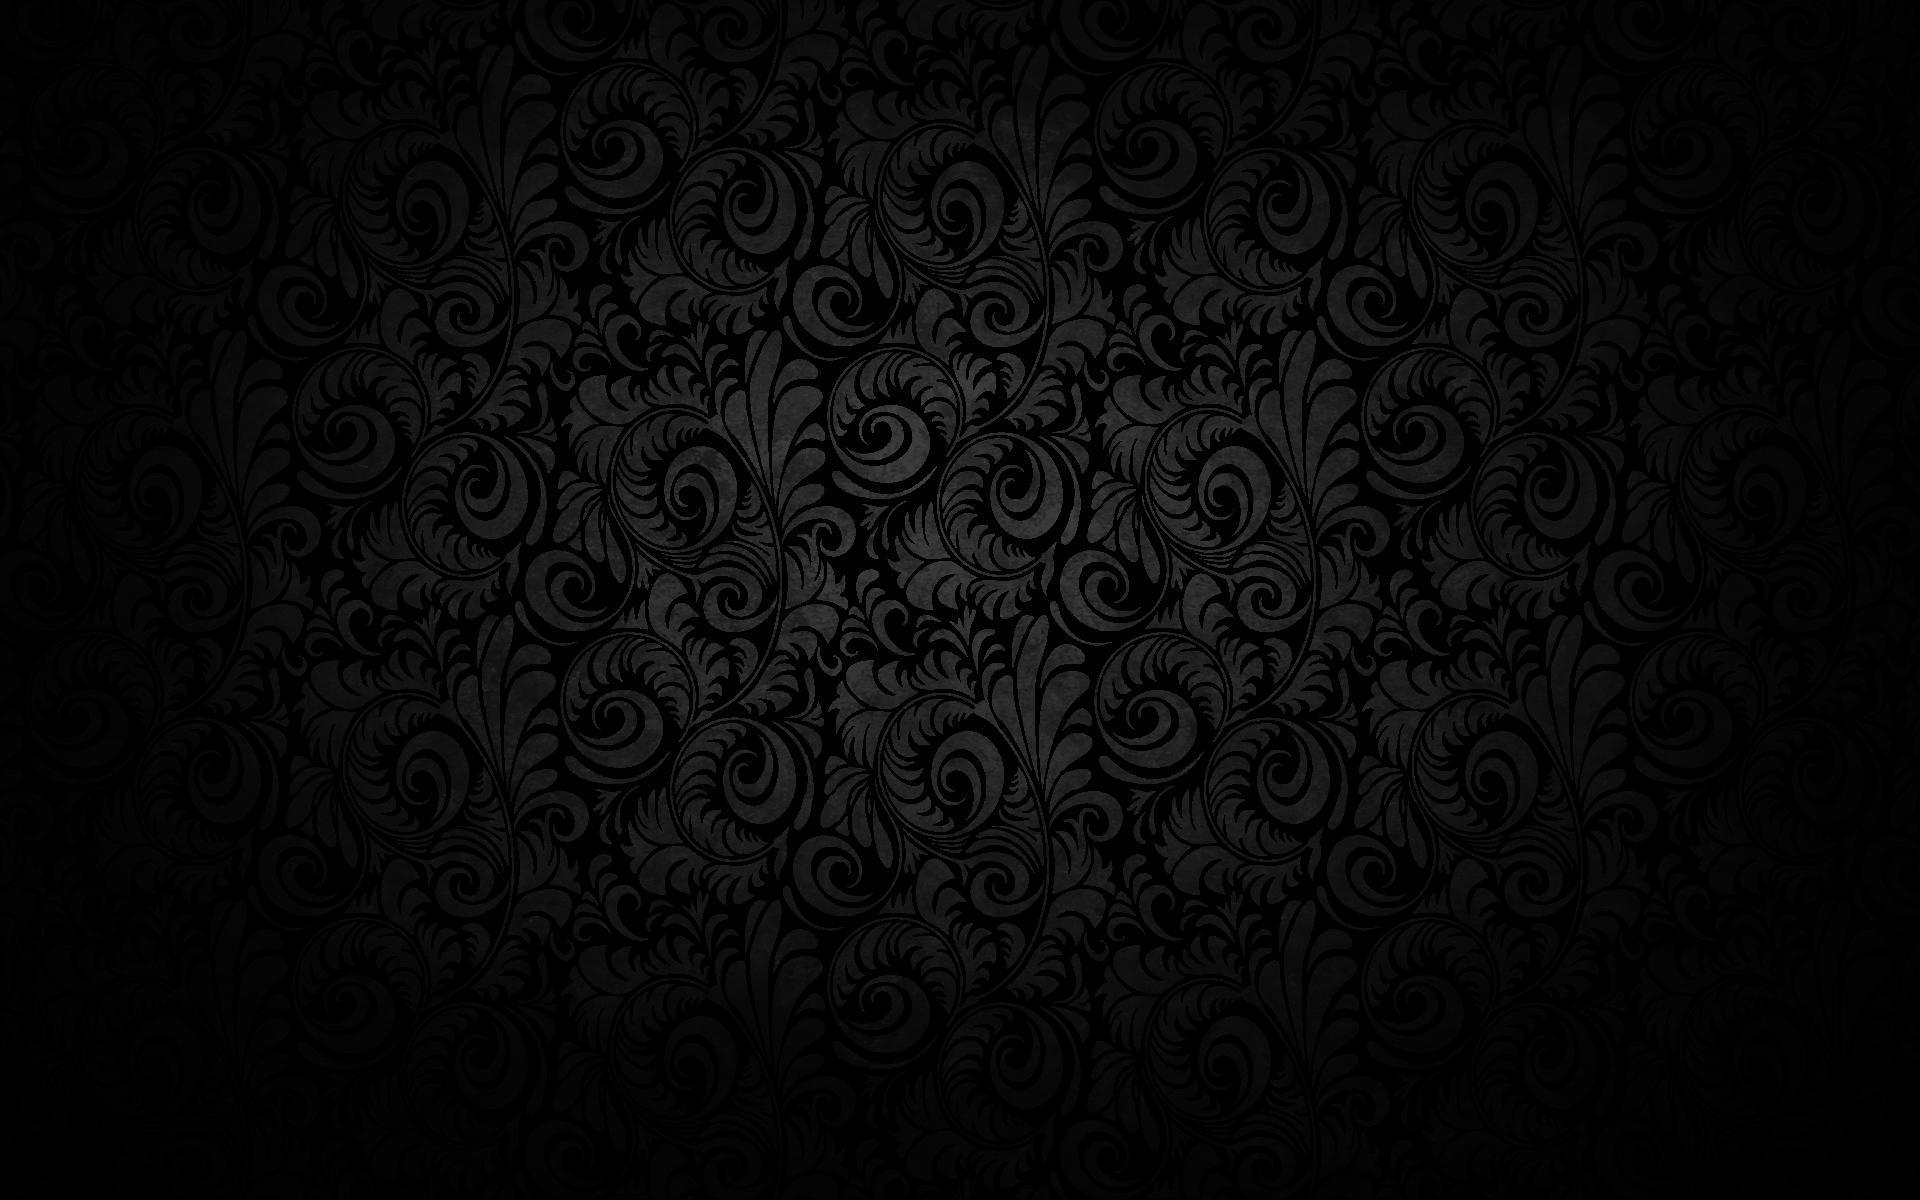 gothic patterns wallpaper pattern - photo #1